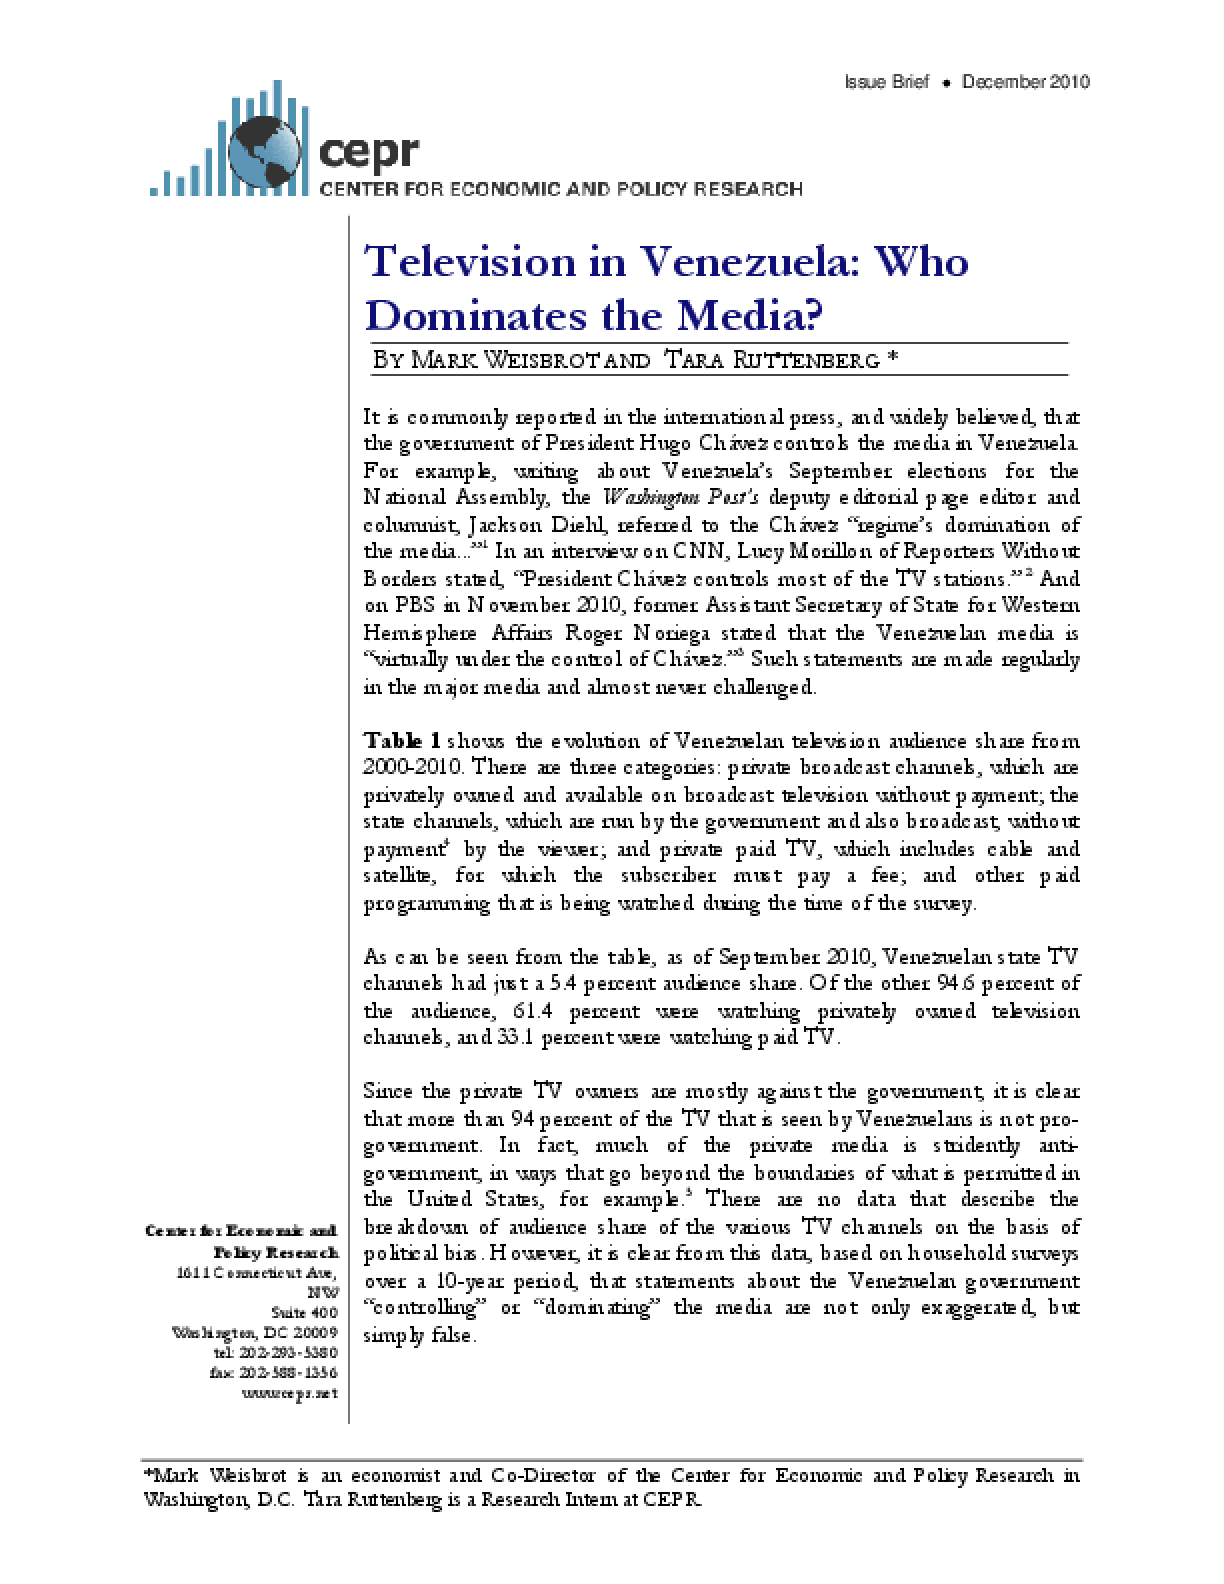 Television in Venezuela: Who Dominates the Media?